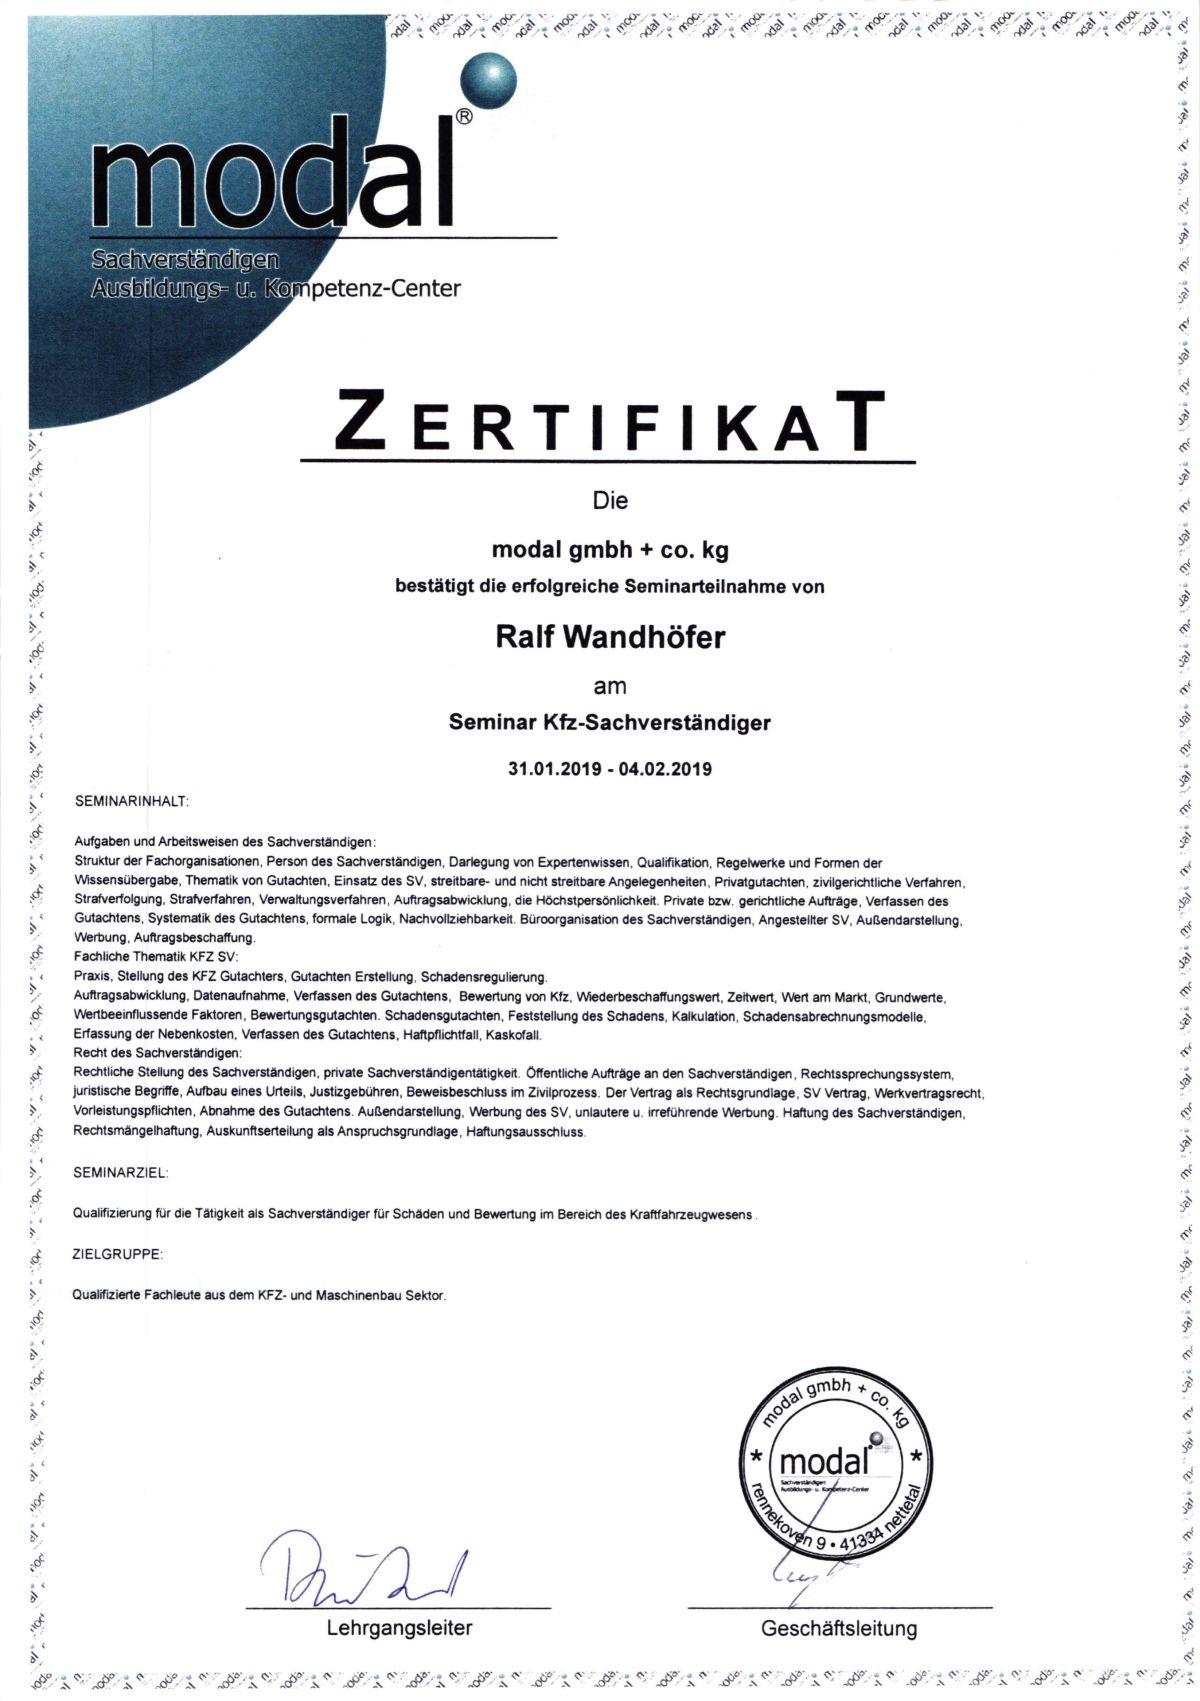 Ralf_Wandhöfer_Zertifikat_008